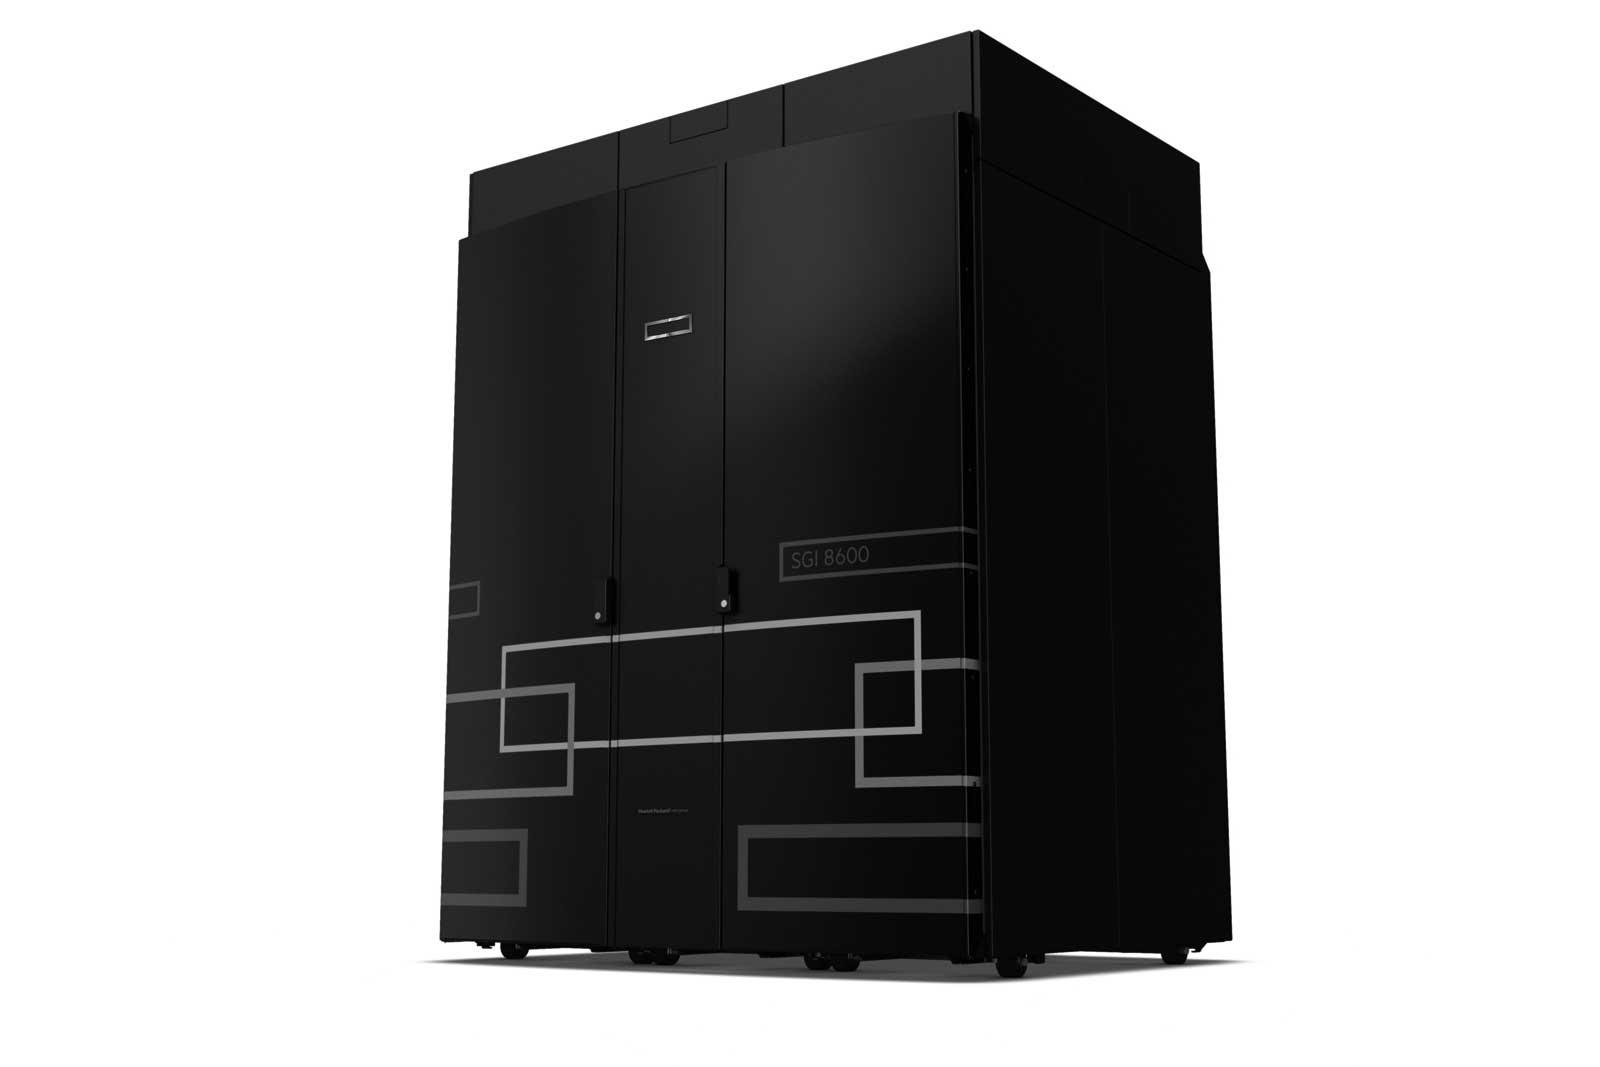 HPE создала суперкомпьютер Blue Brain 5 для симуляции мозга млекопитаю